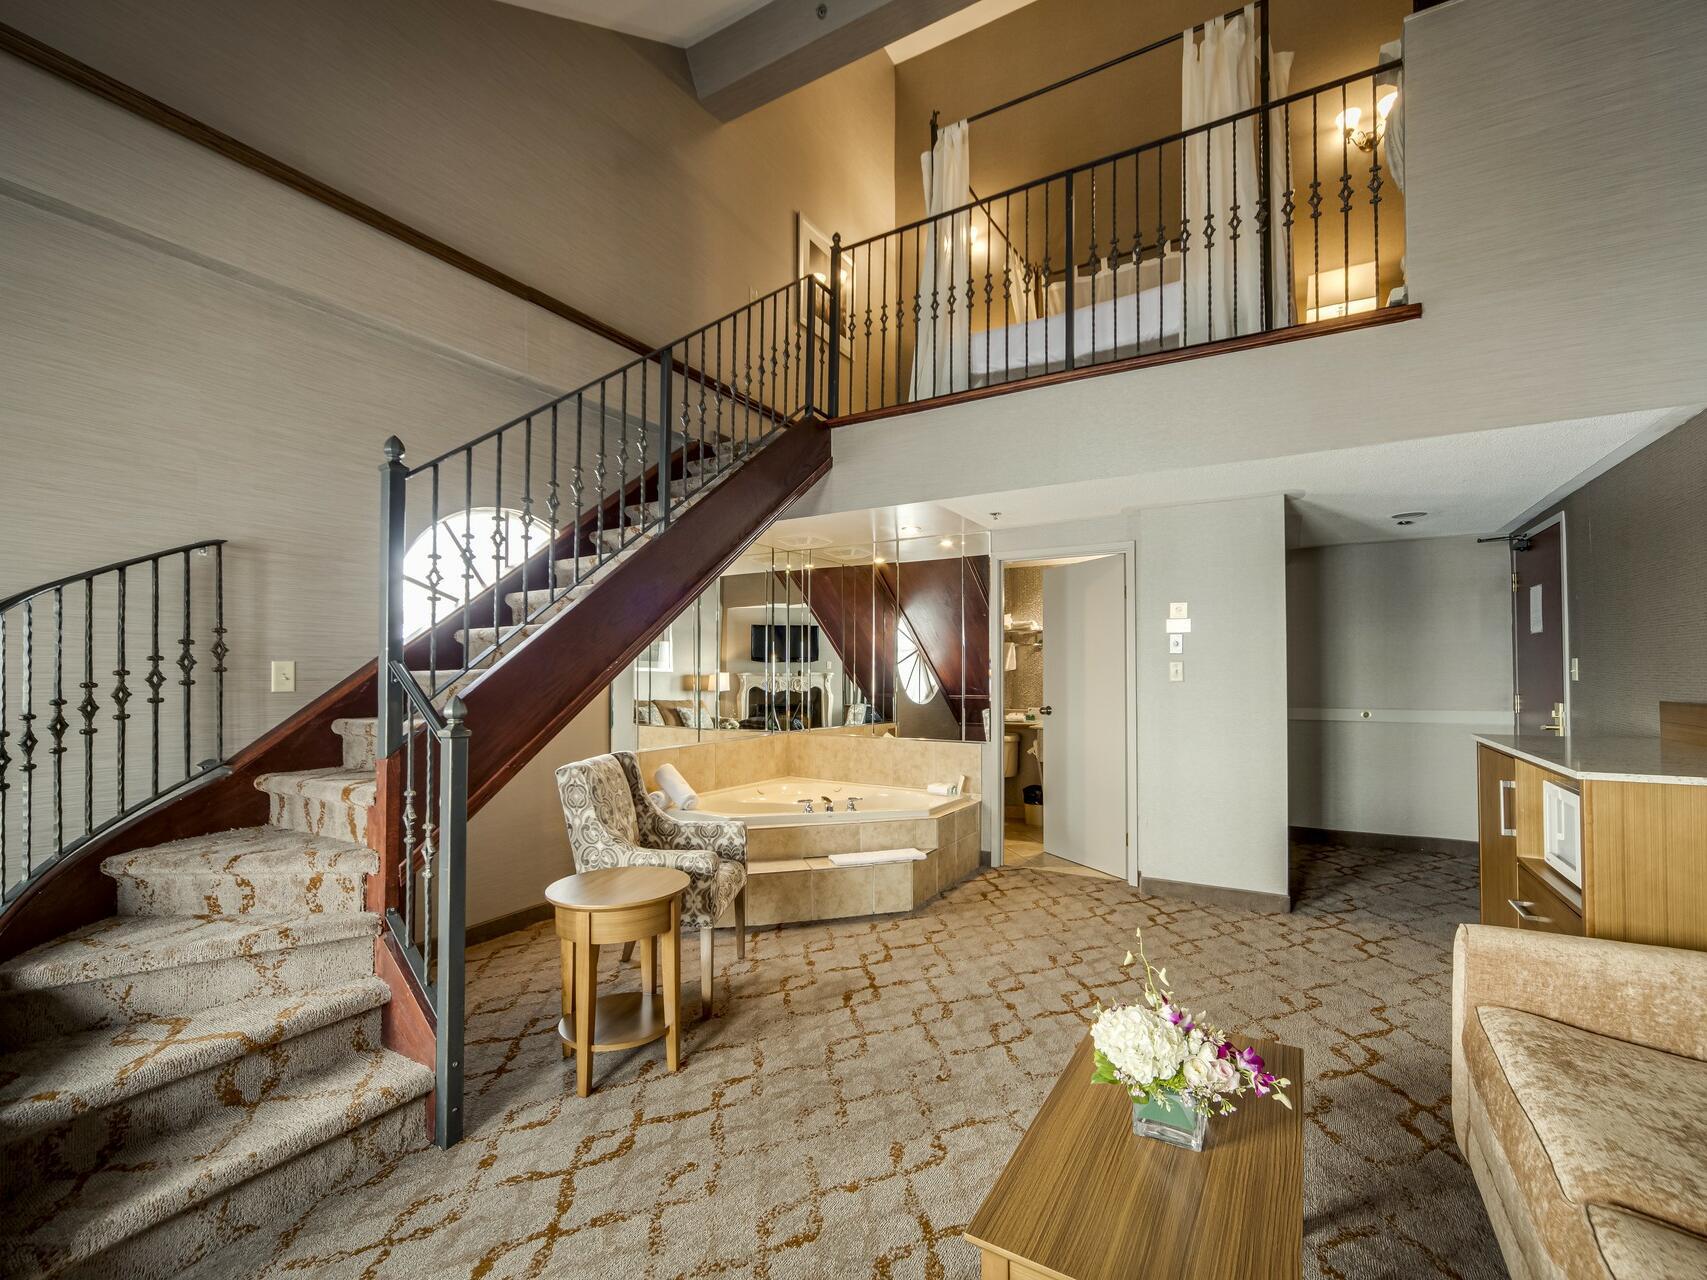 Romeo and Juliet Suit lobby at Monte Carlo Inn Vaughan Suites